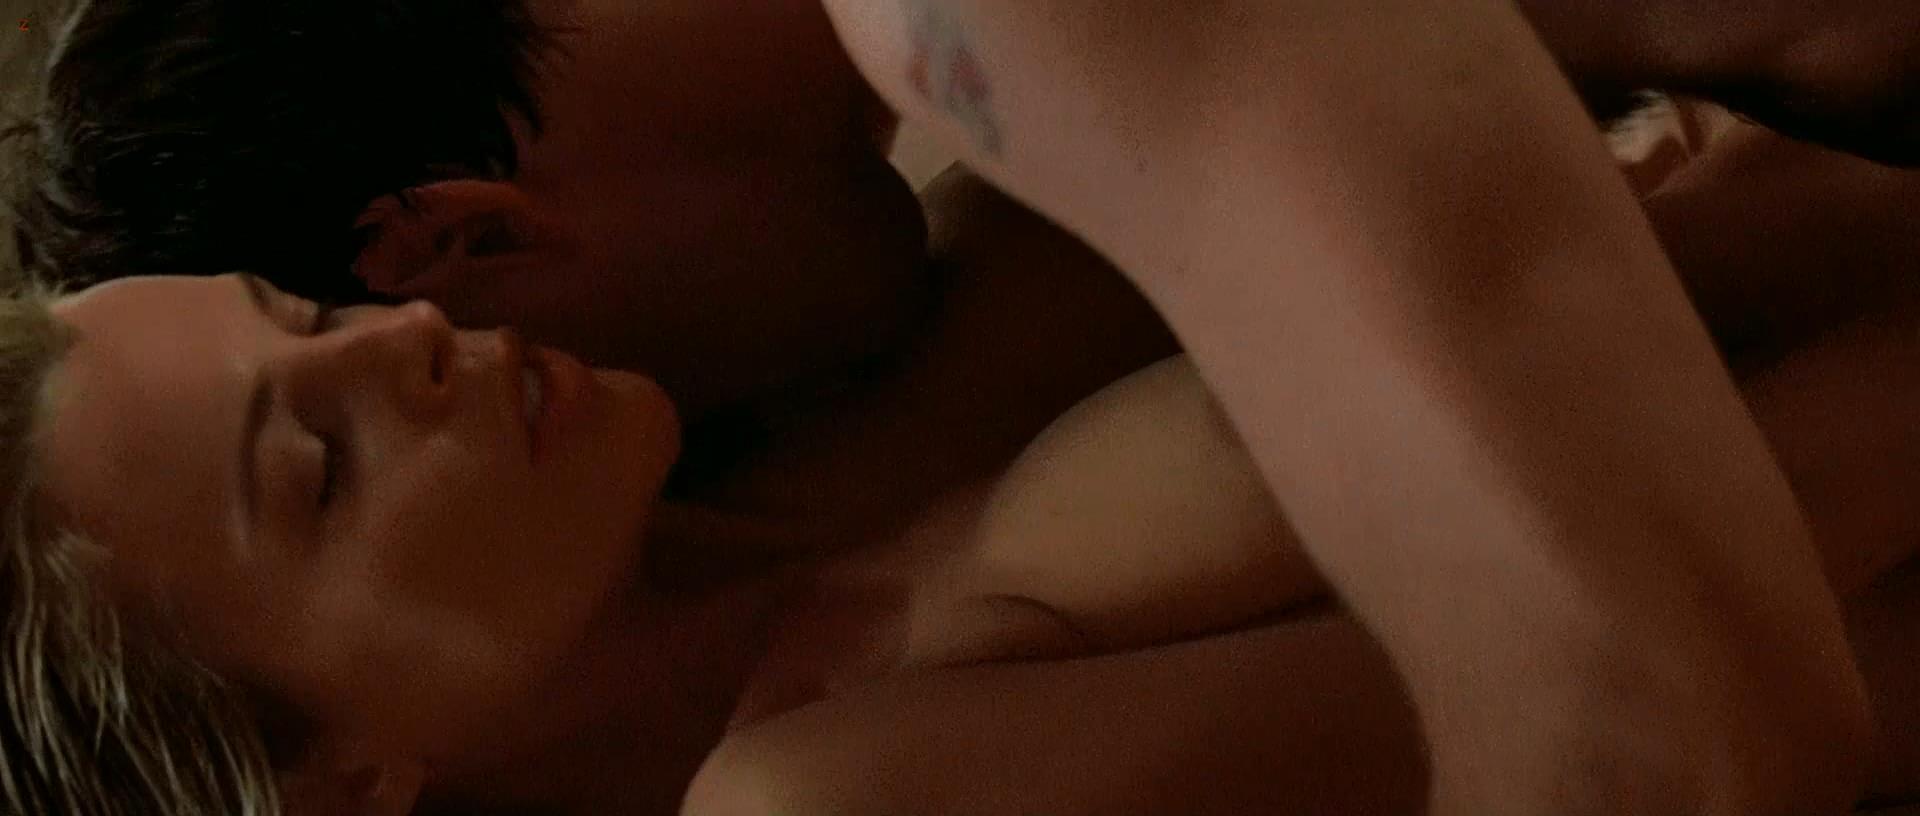 kim basinger hot sex